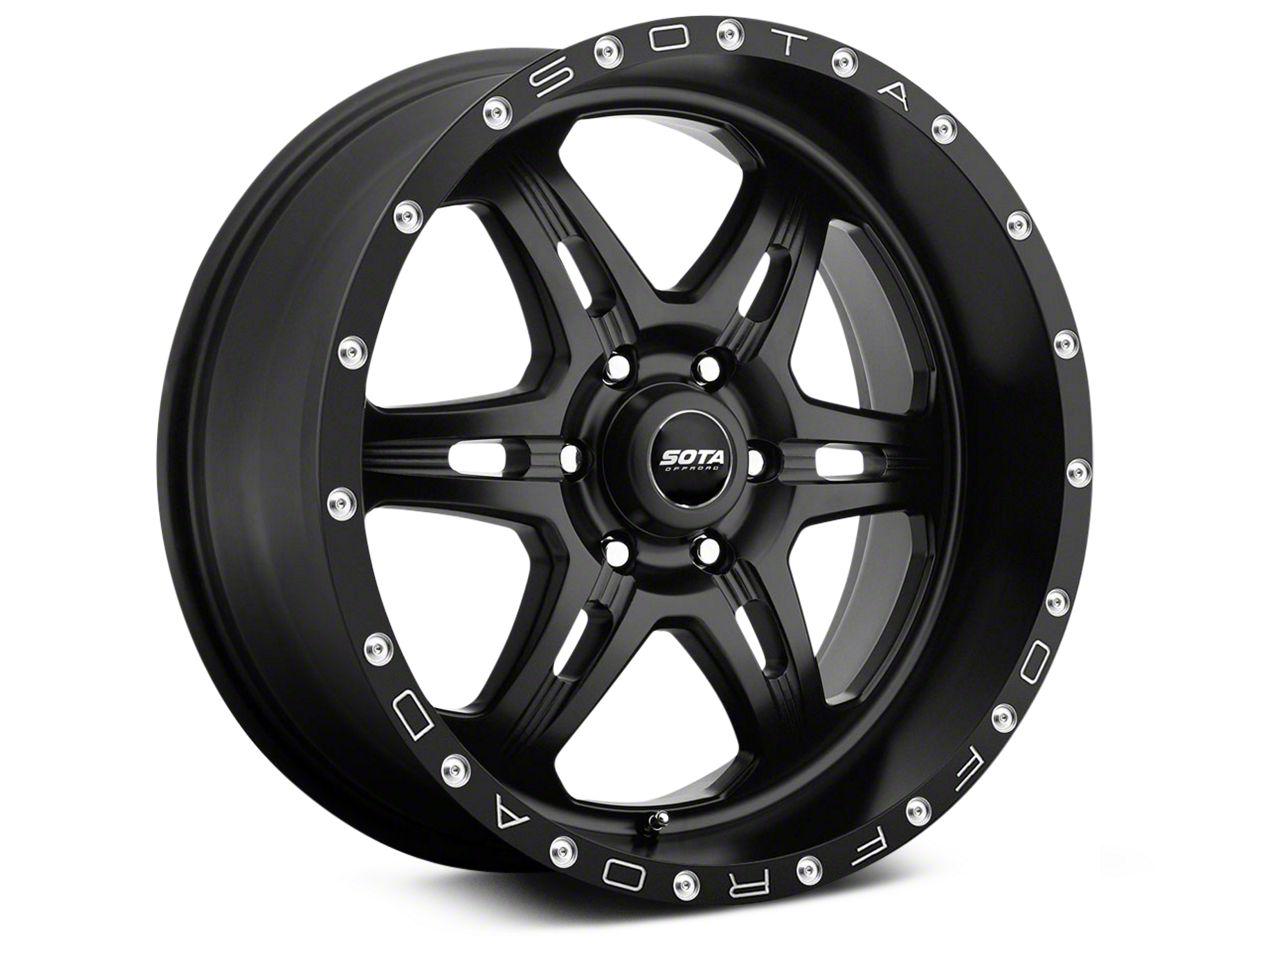 SOTA Off Road FITE Stealth Black 6-Lug Wheel - 20x9 (99-18 Silverado 1500)